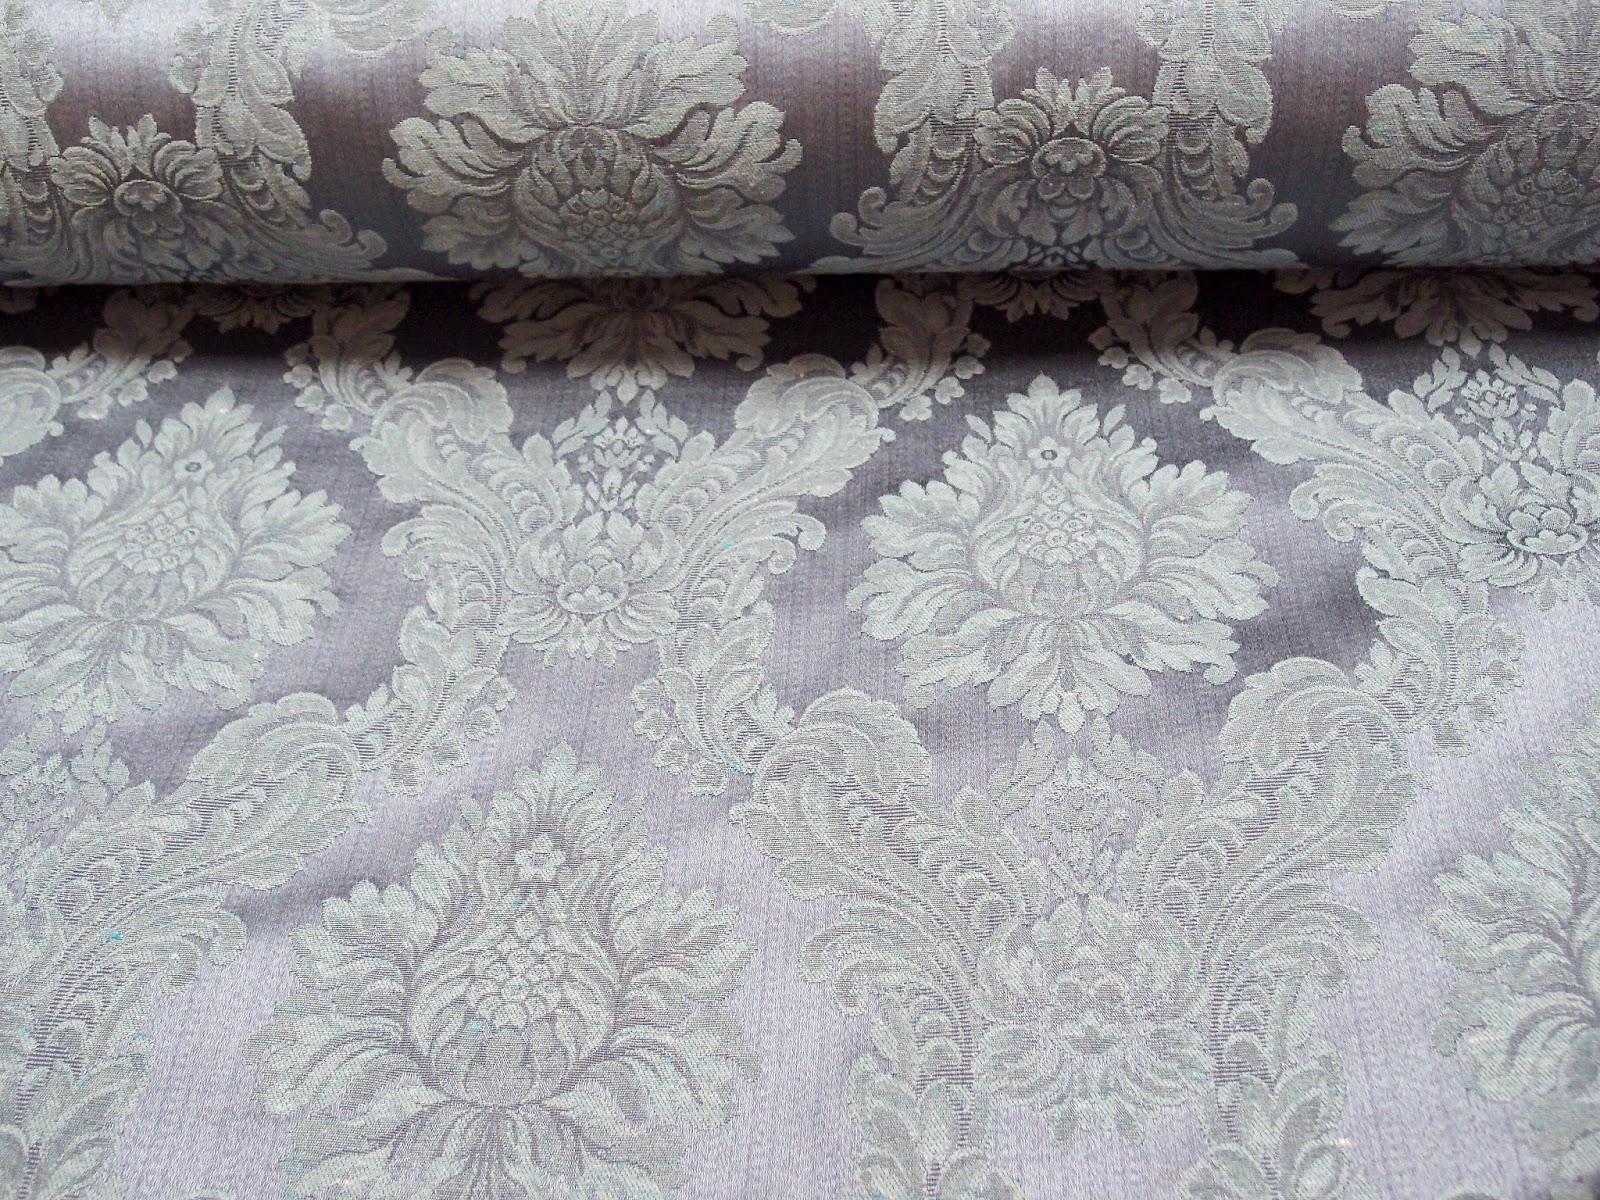 Tessuti Per Divani Classici.I Classici Tessuti Per Tappezzare Mobili Antichi Antichita Bellini